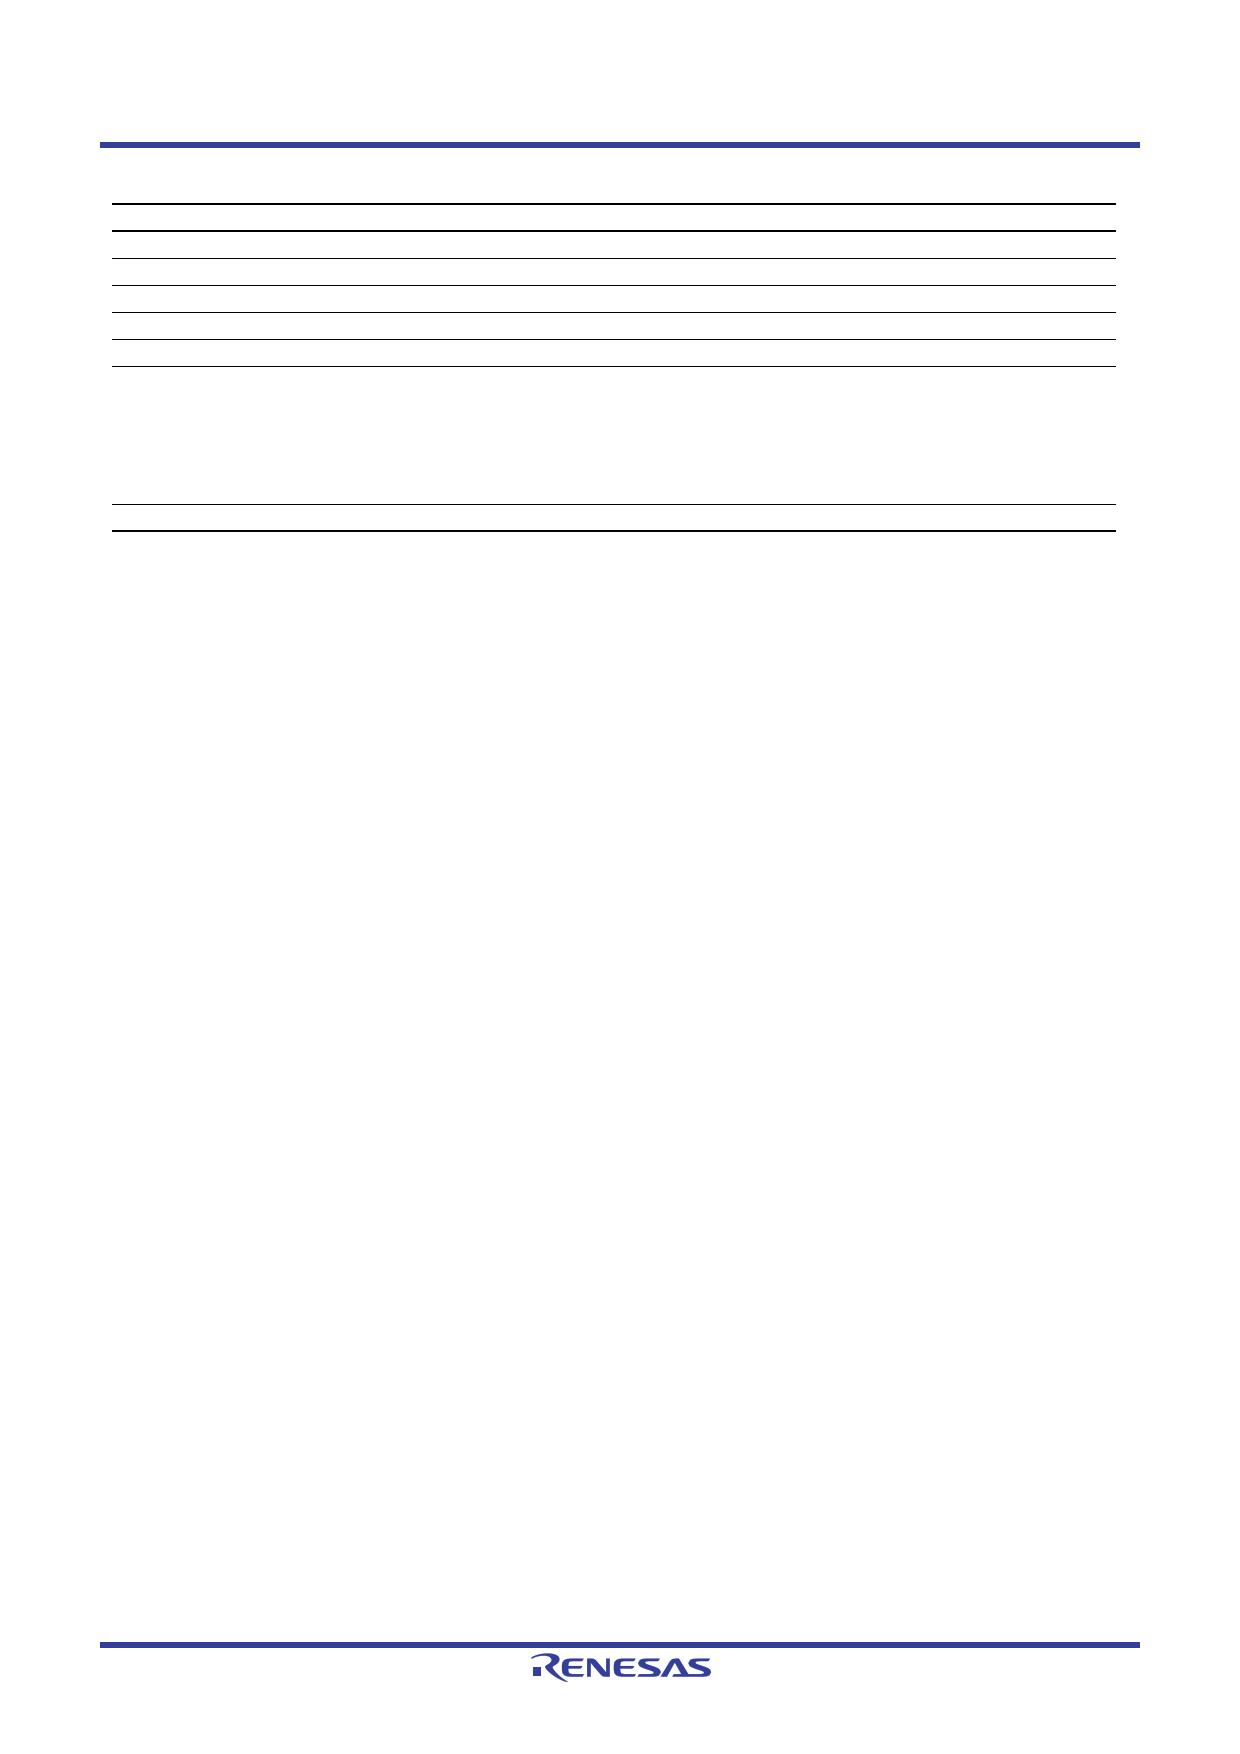 R5F51104AGNE pdf, 반도체, 판매, 대치품